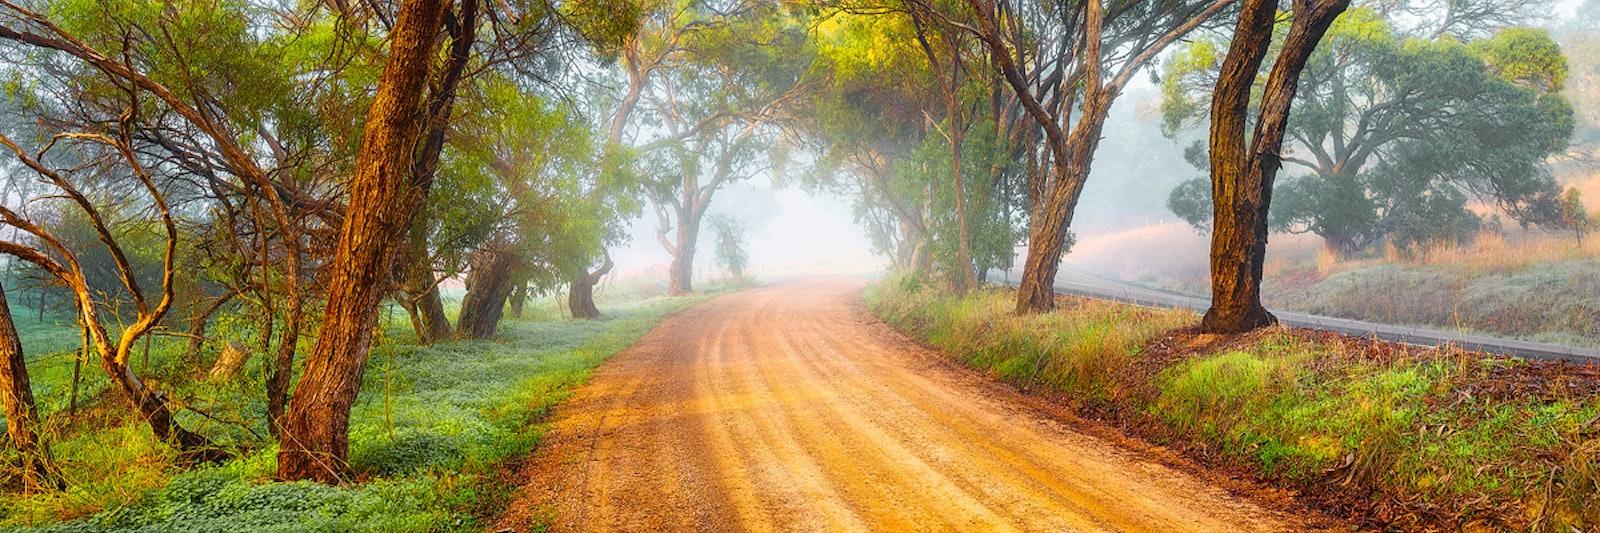 Moirai - Adelaide Hills, SA